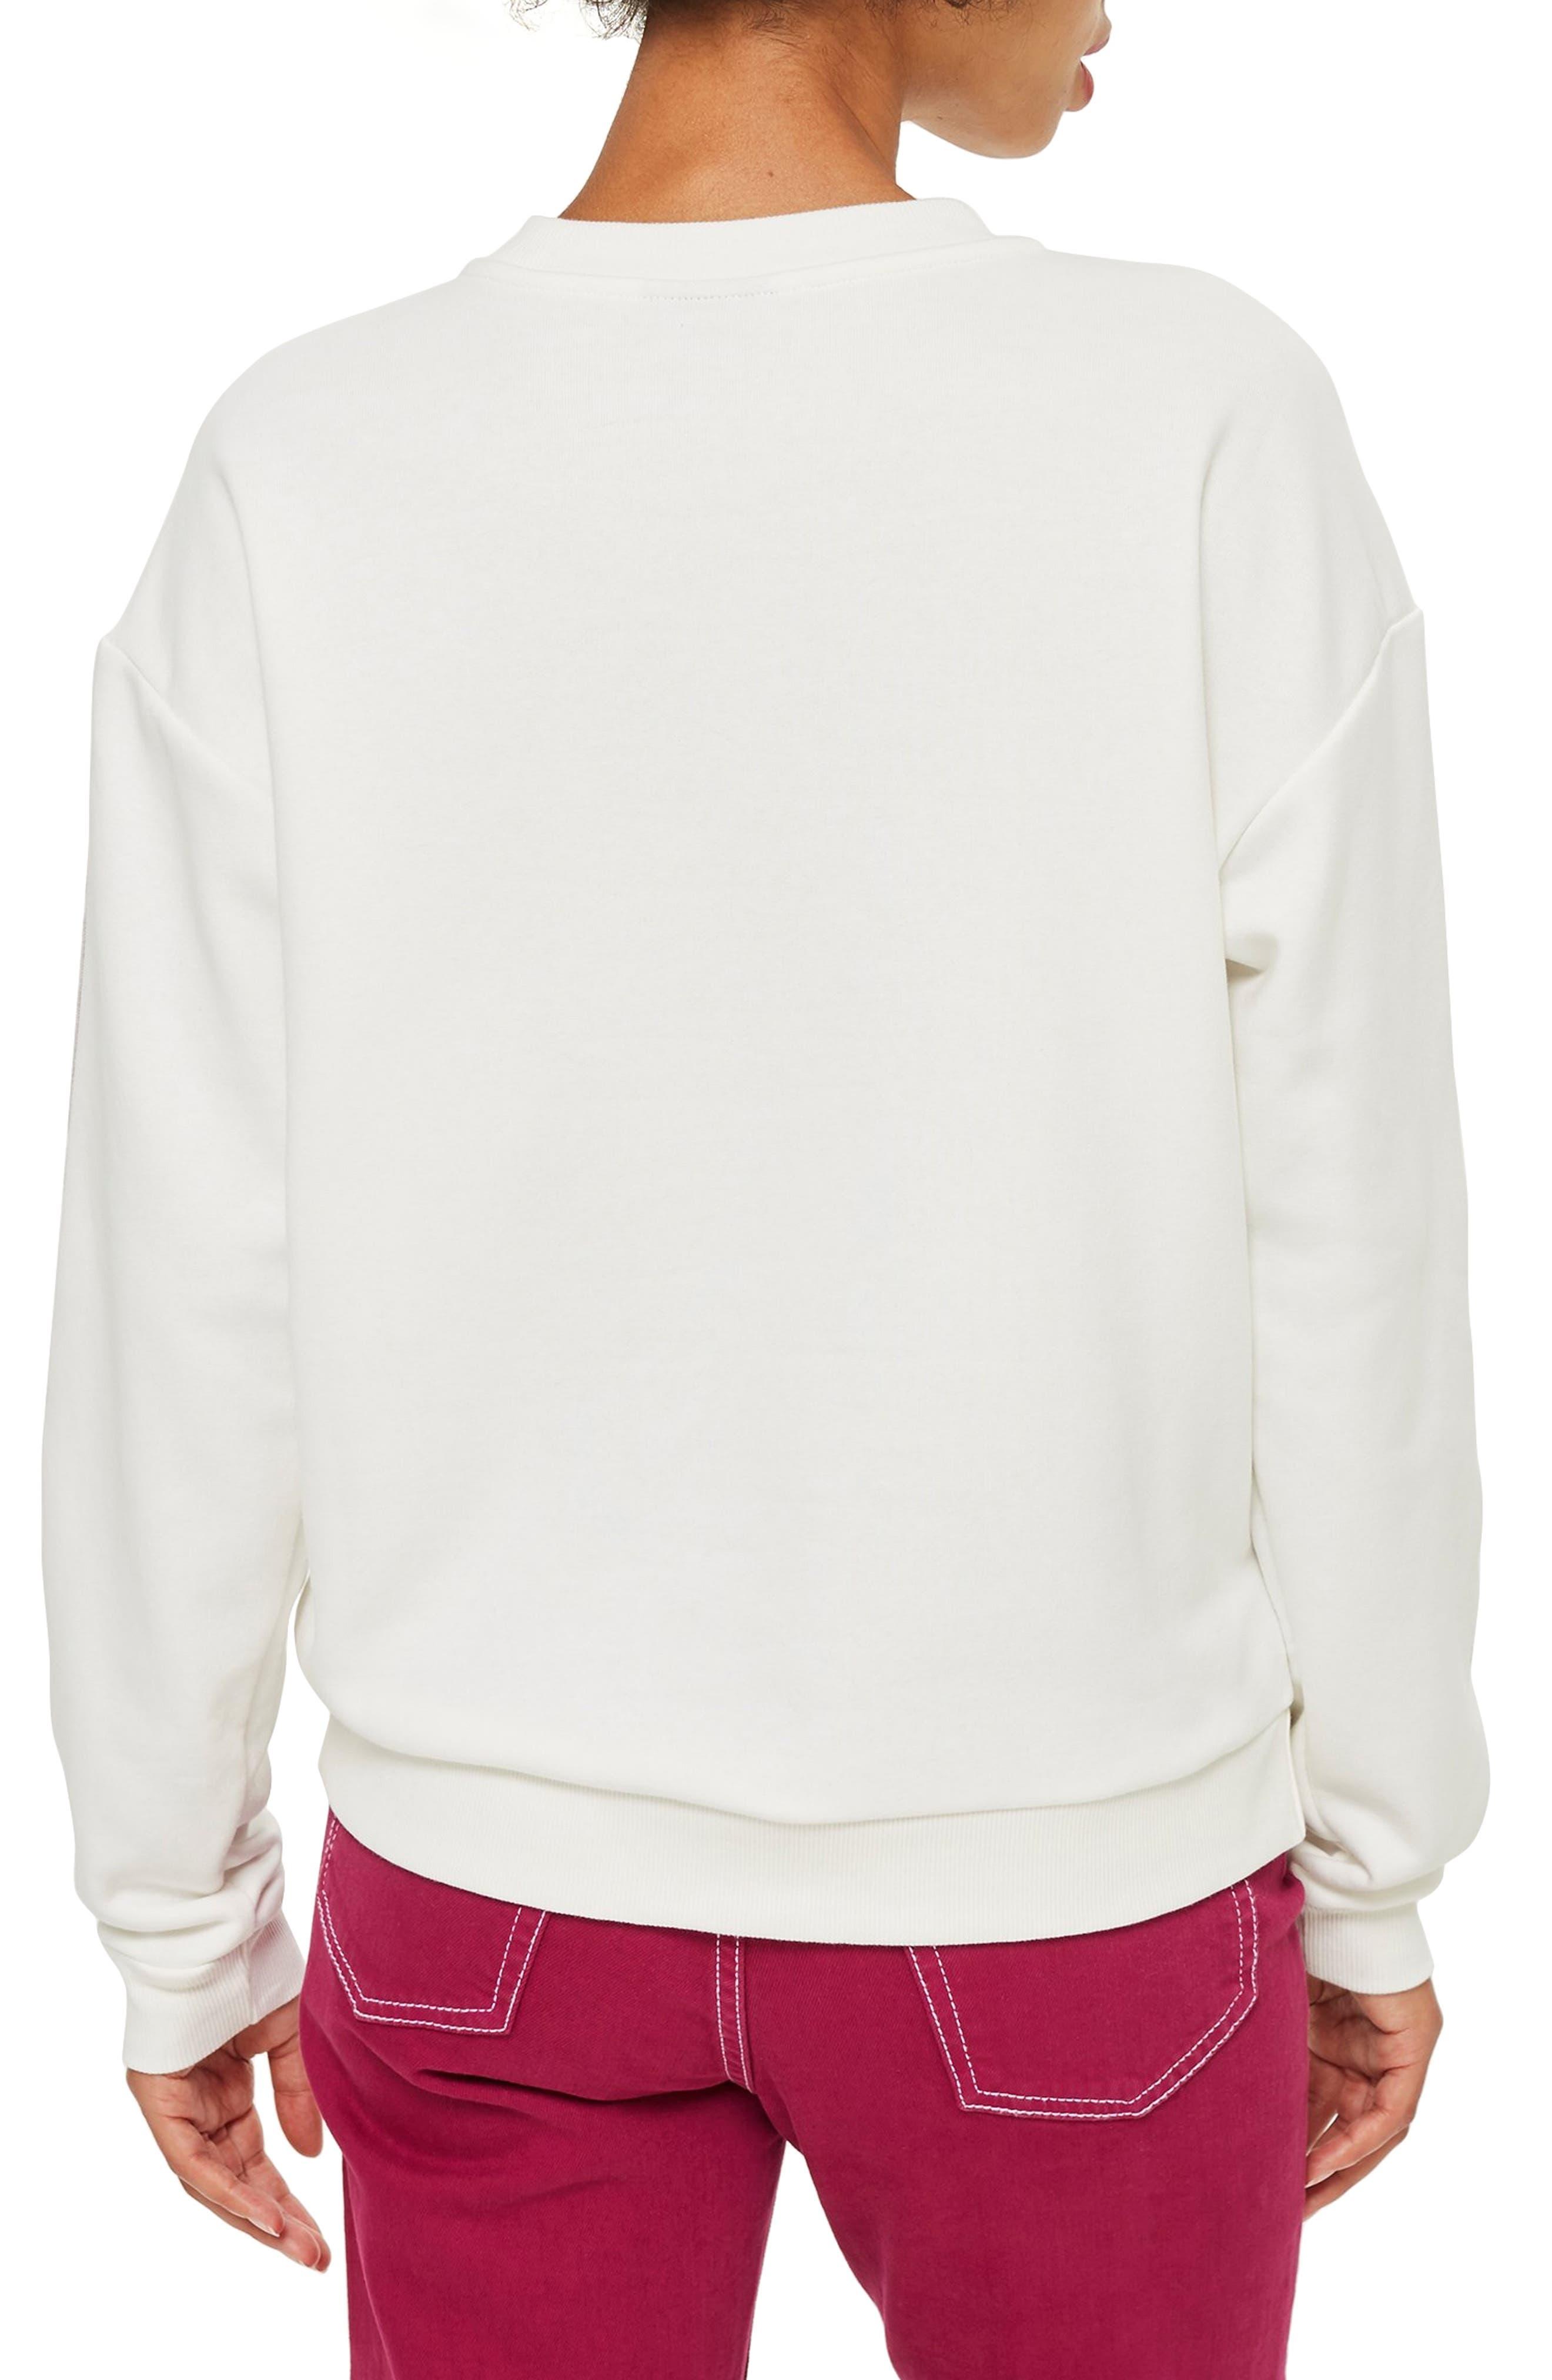 Taped Sleeve Sweatshirt,                             Alternate thumbnail 2, color,                             100